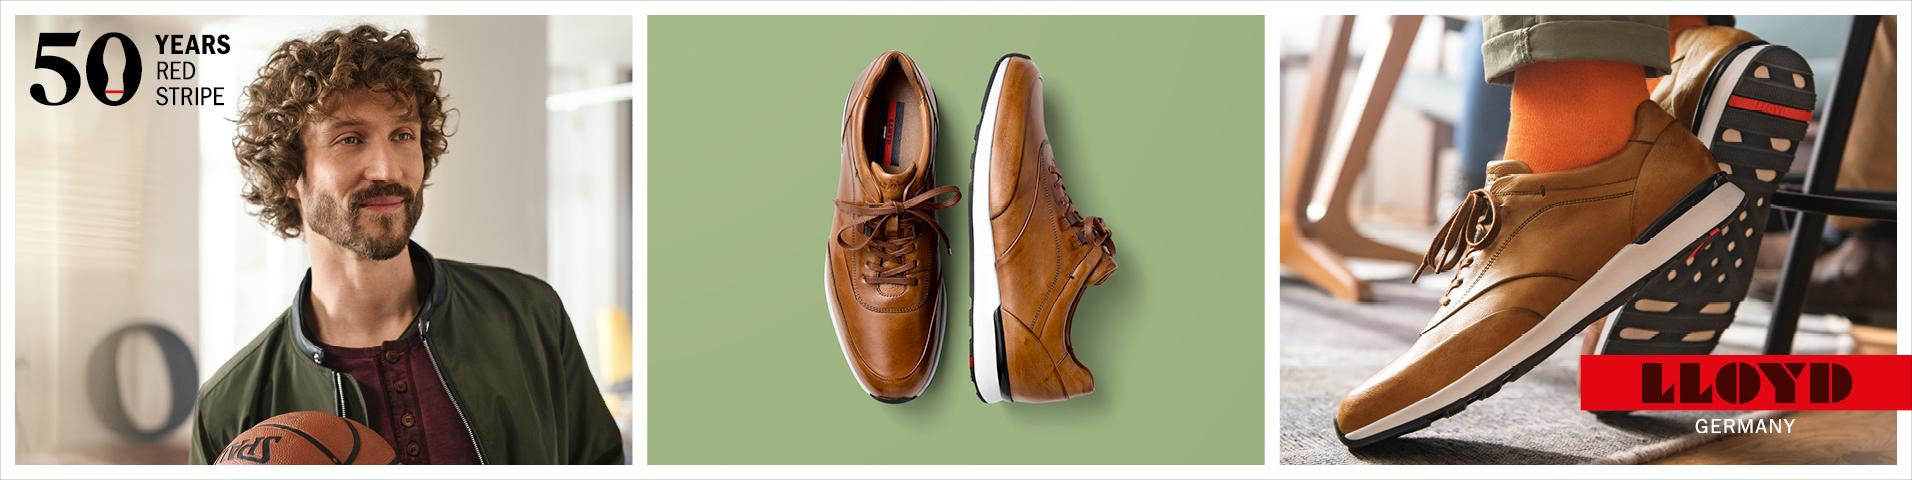 Rebajas en moda para hombre | Catálogo online en Zalando